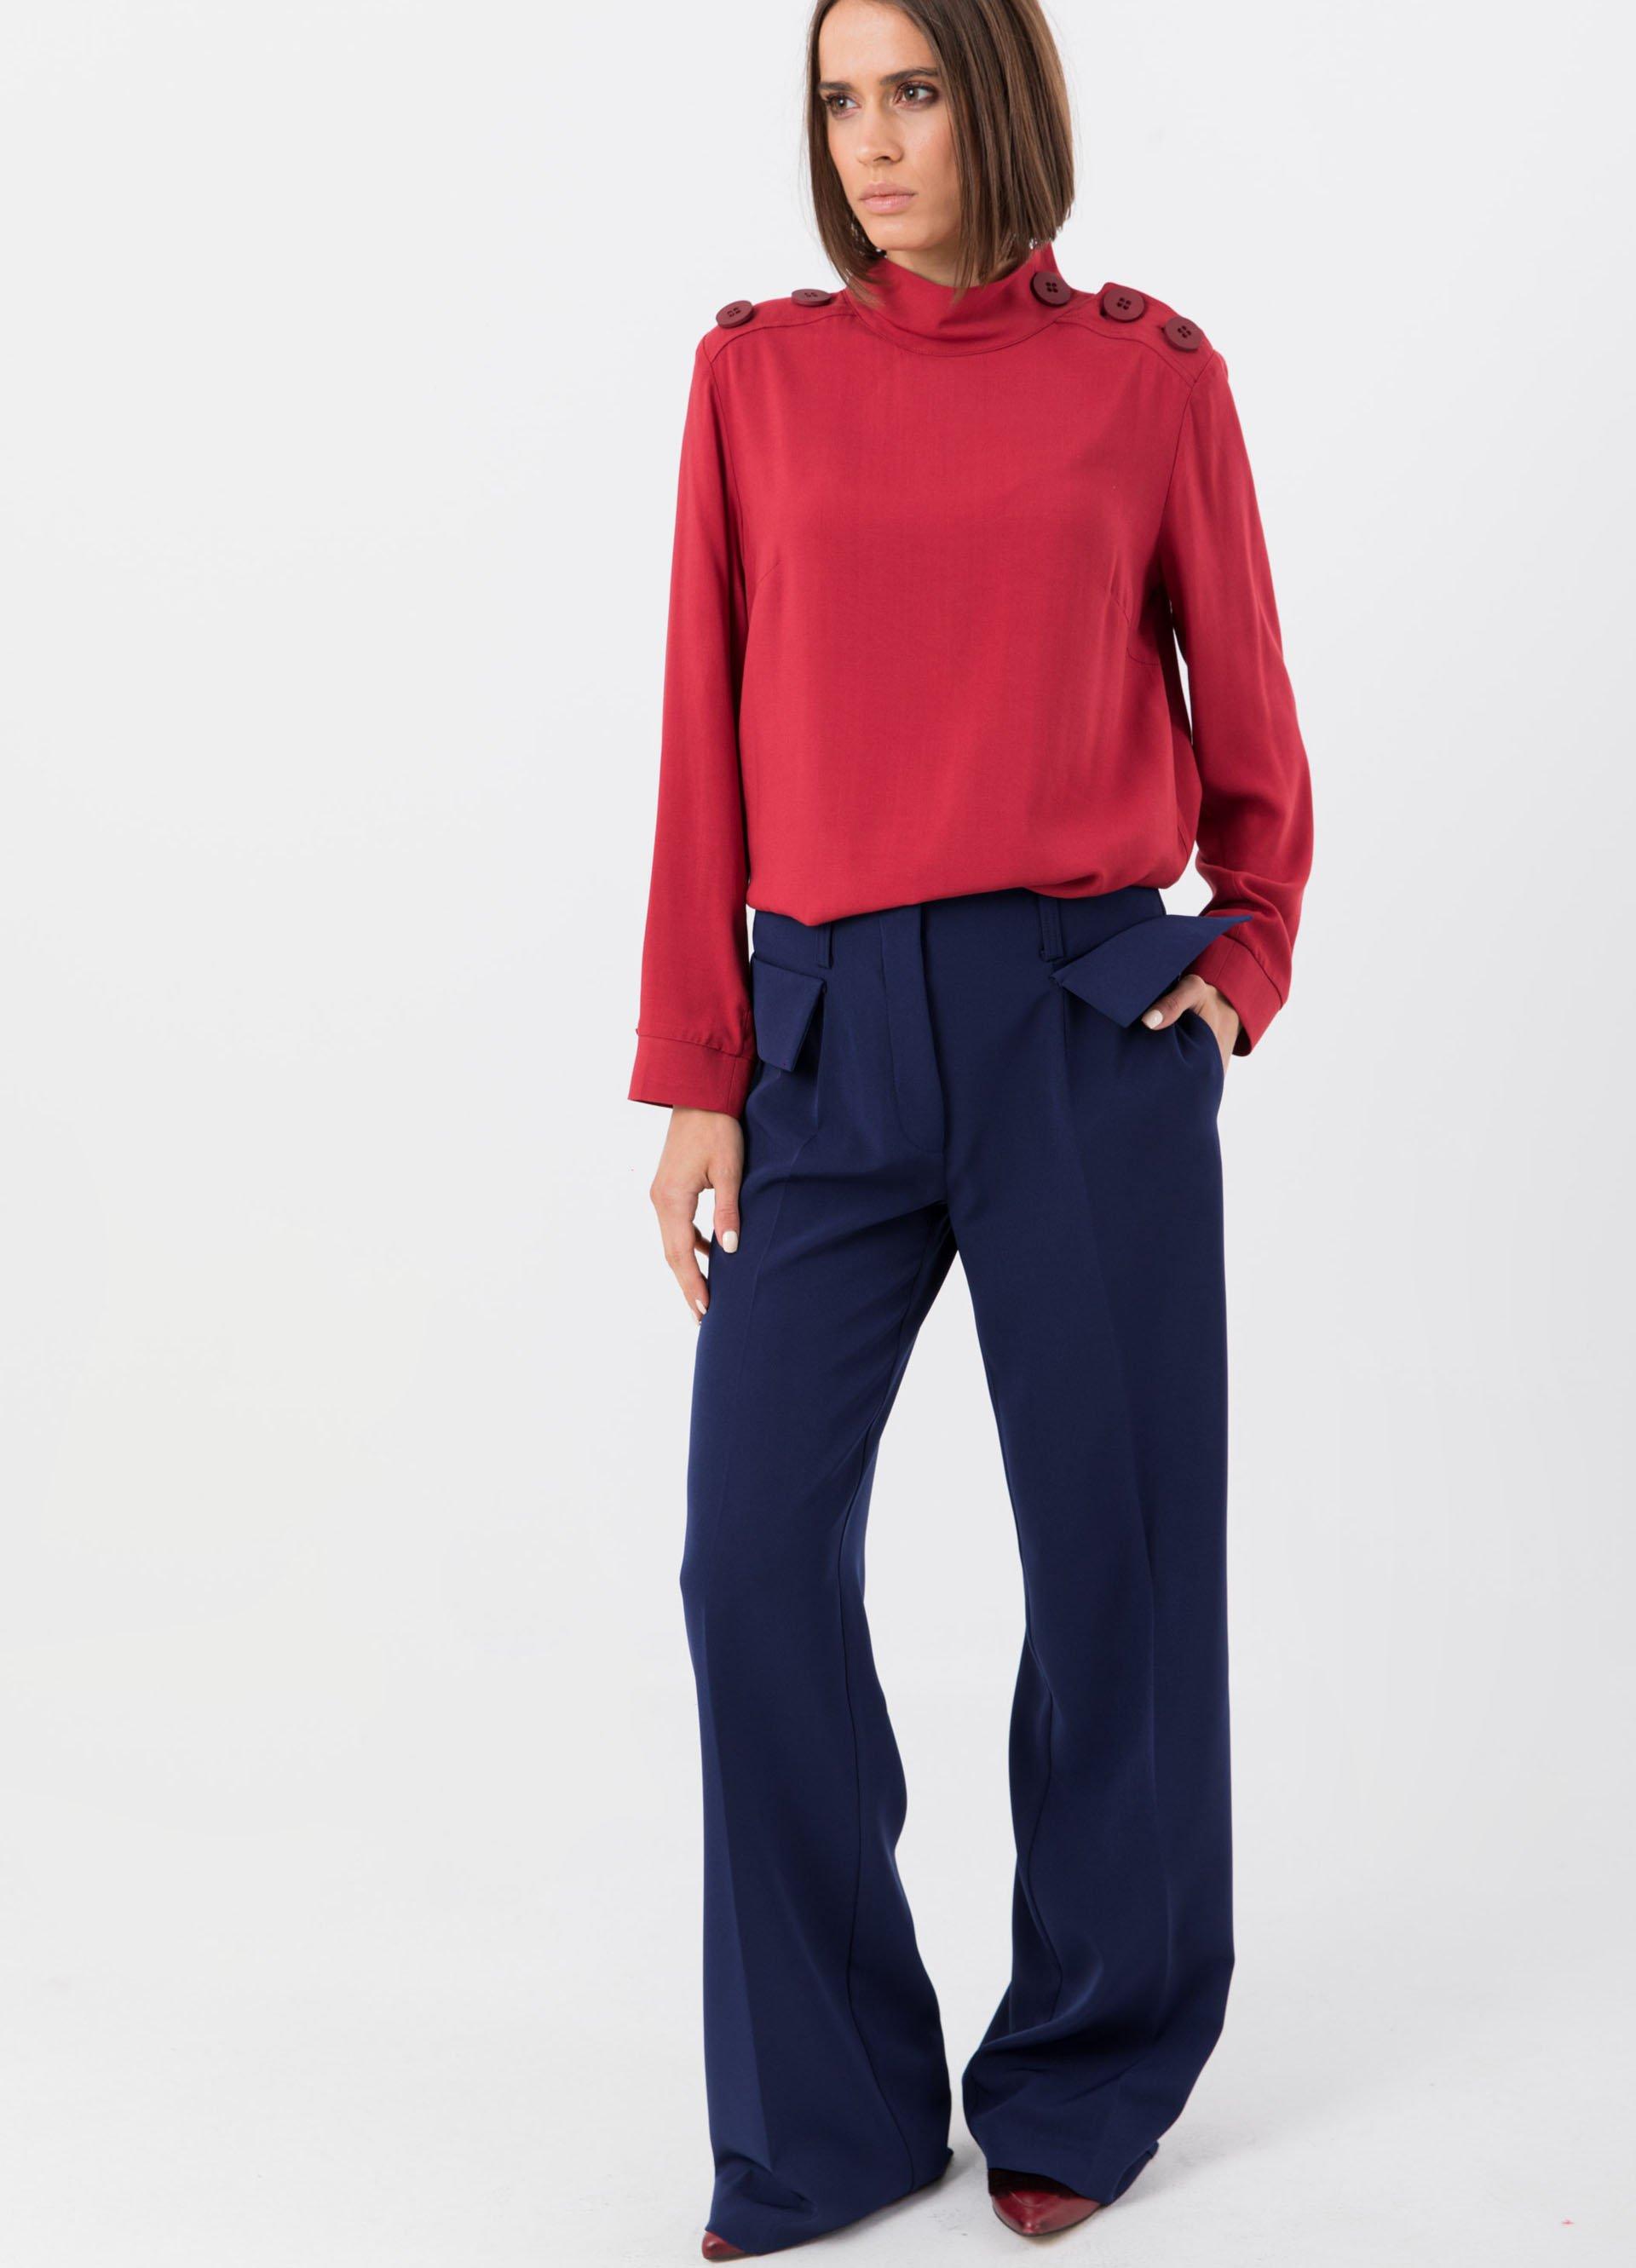 Ps fashion pantalone